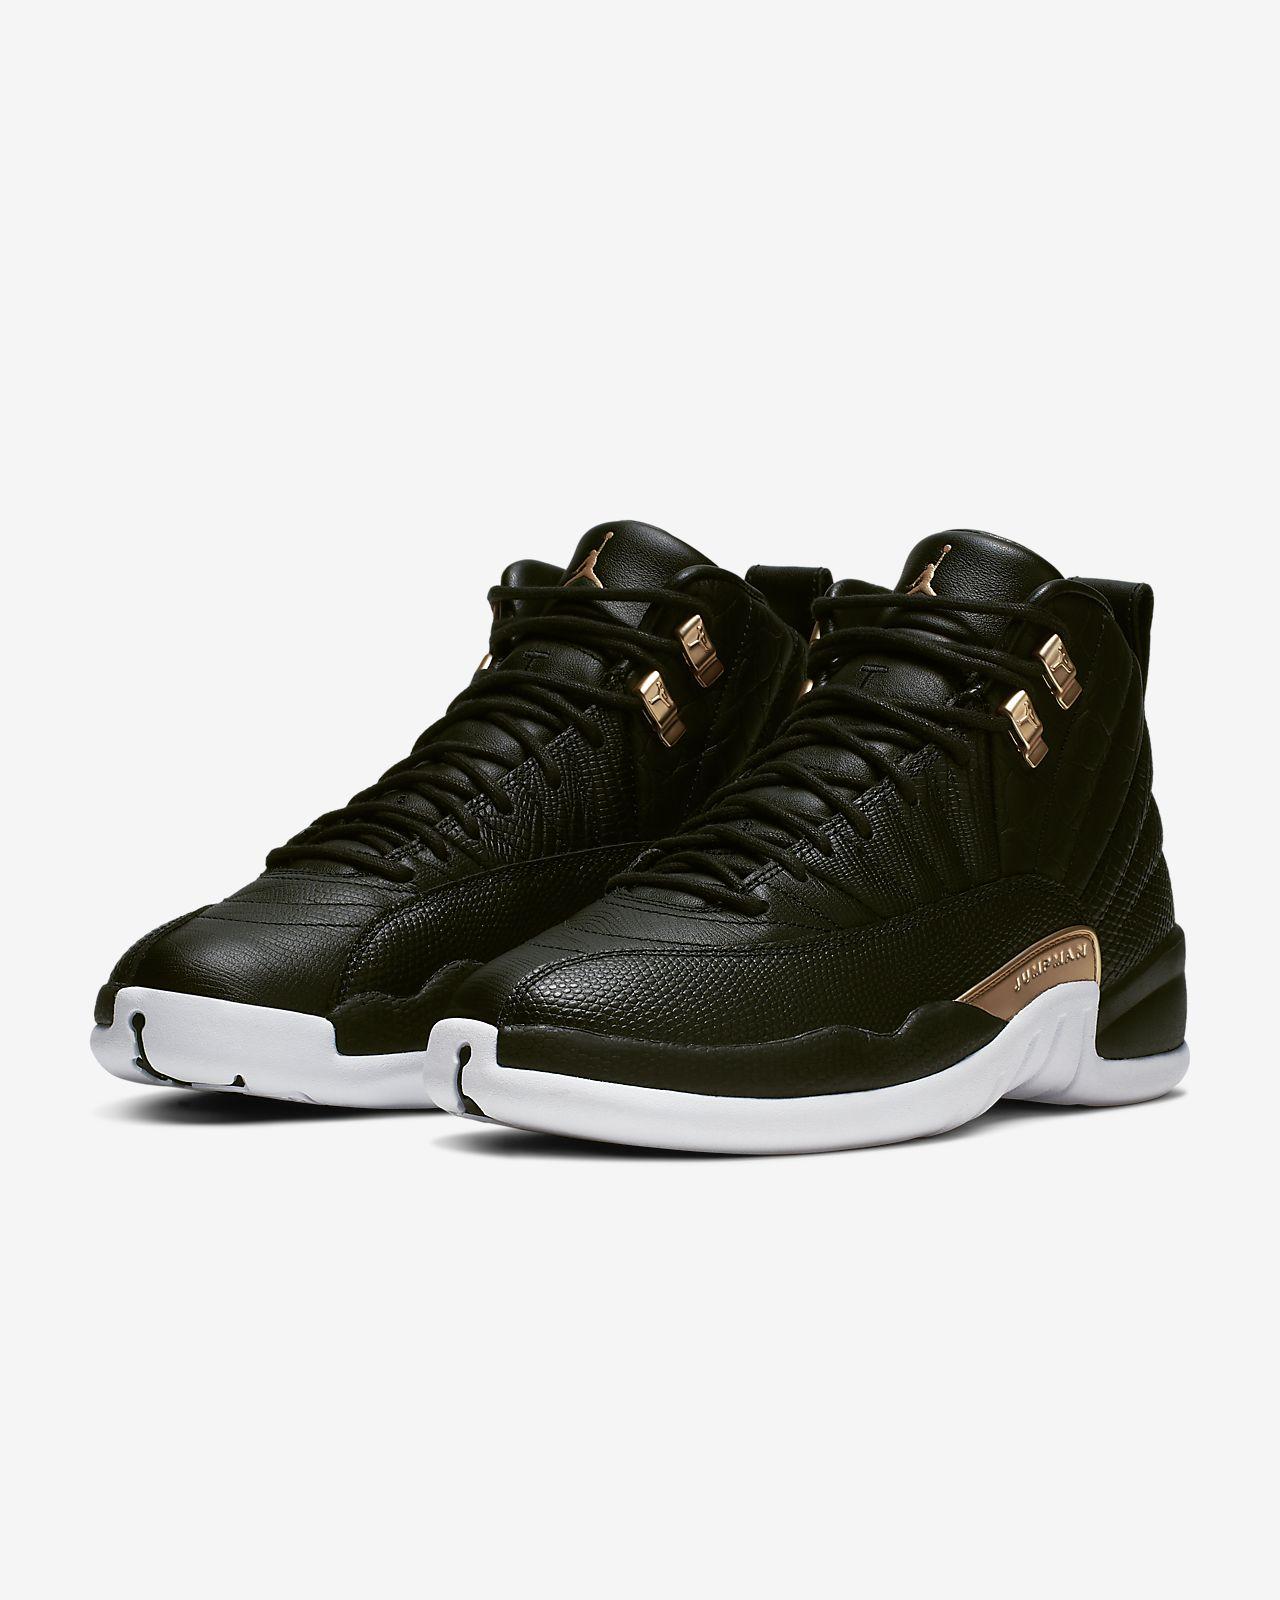 b7051283a431 Air Jordan 12 Retro Women s Shoe. Nike.com CA